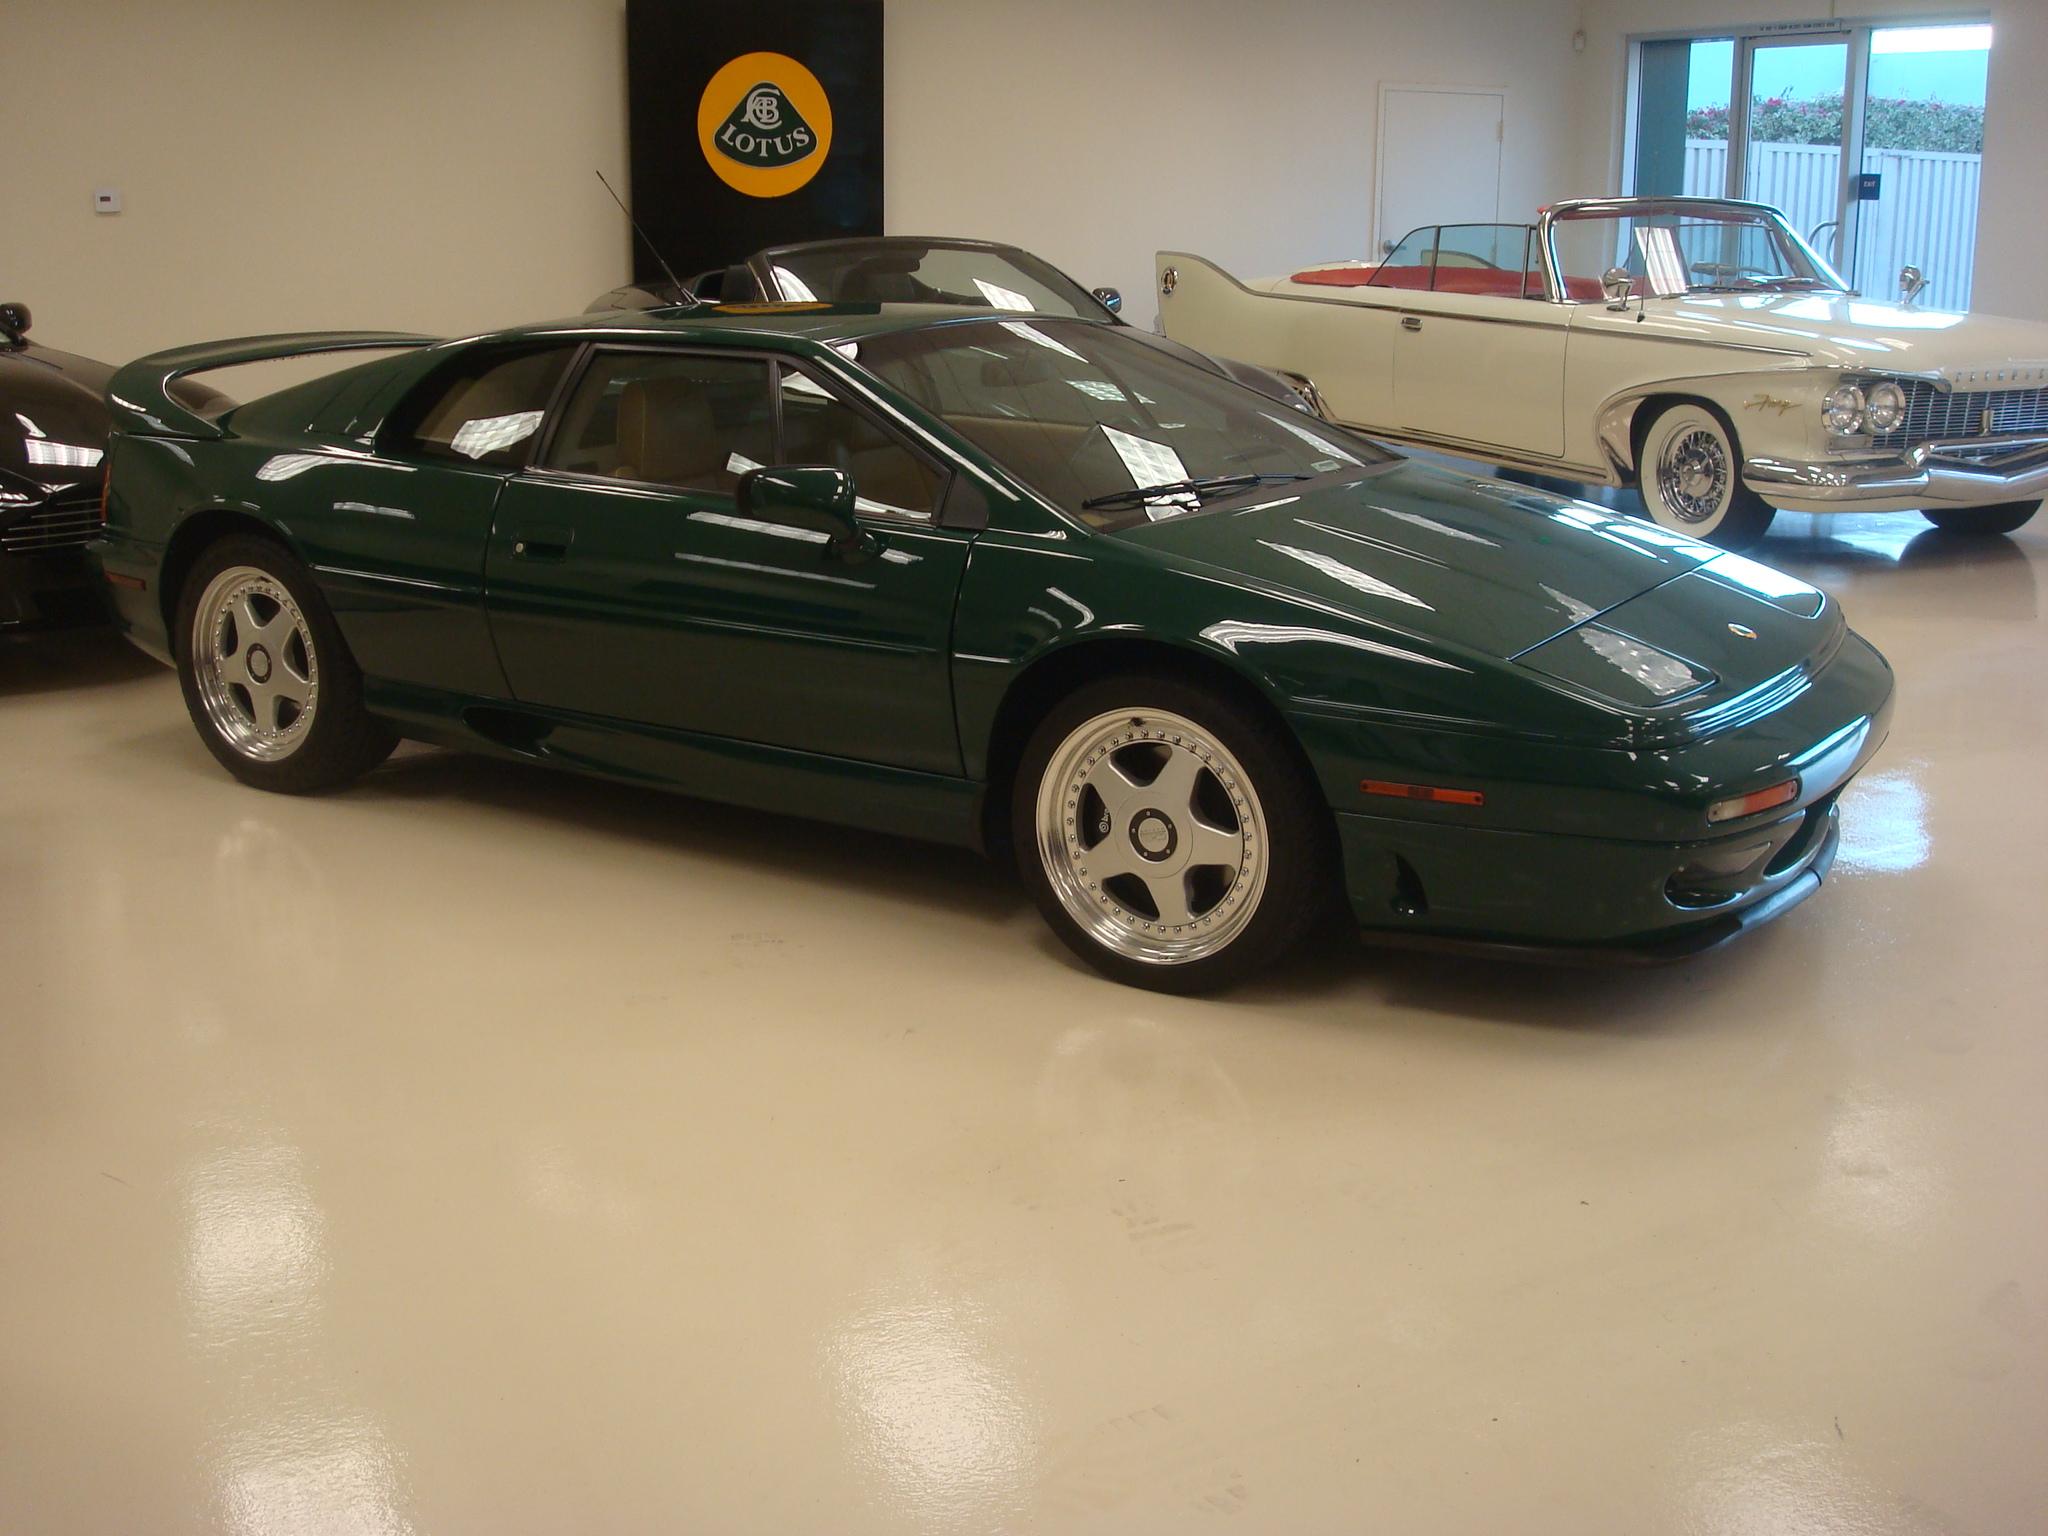 Fs 1995 lotus esprit s4s lotustalk the lotus cars community vanachro Choice Image